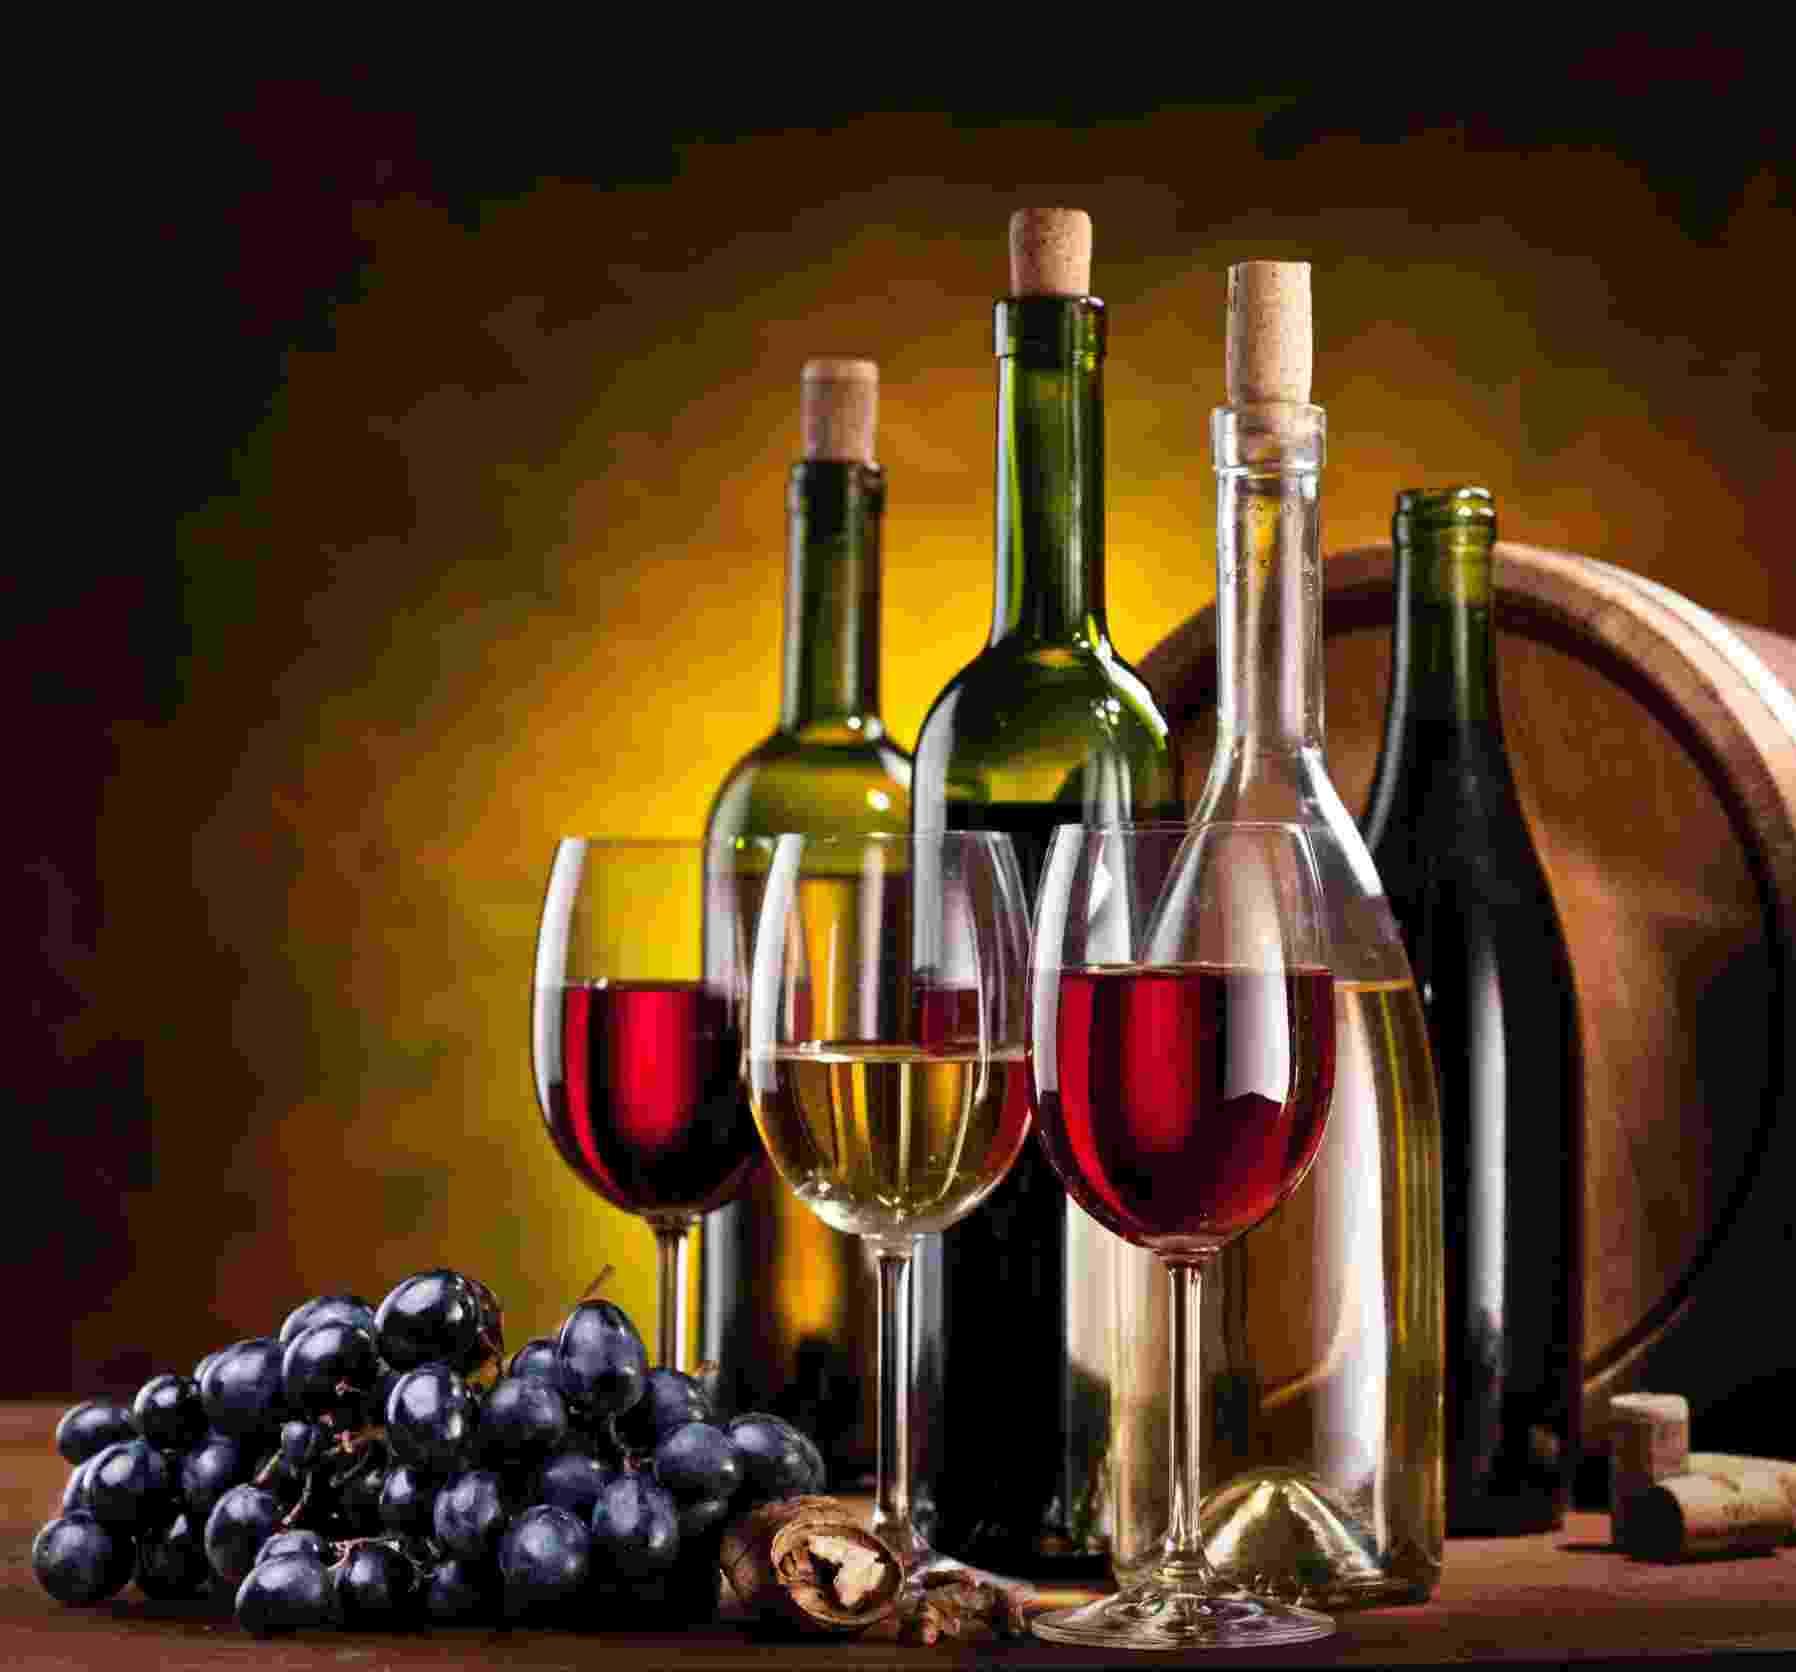 Vinho, garrafa, taça - Thinkstock